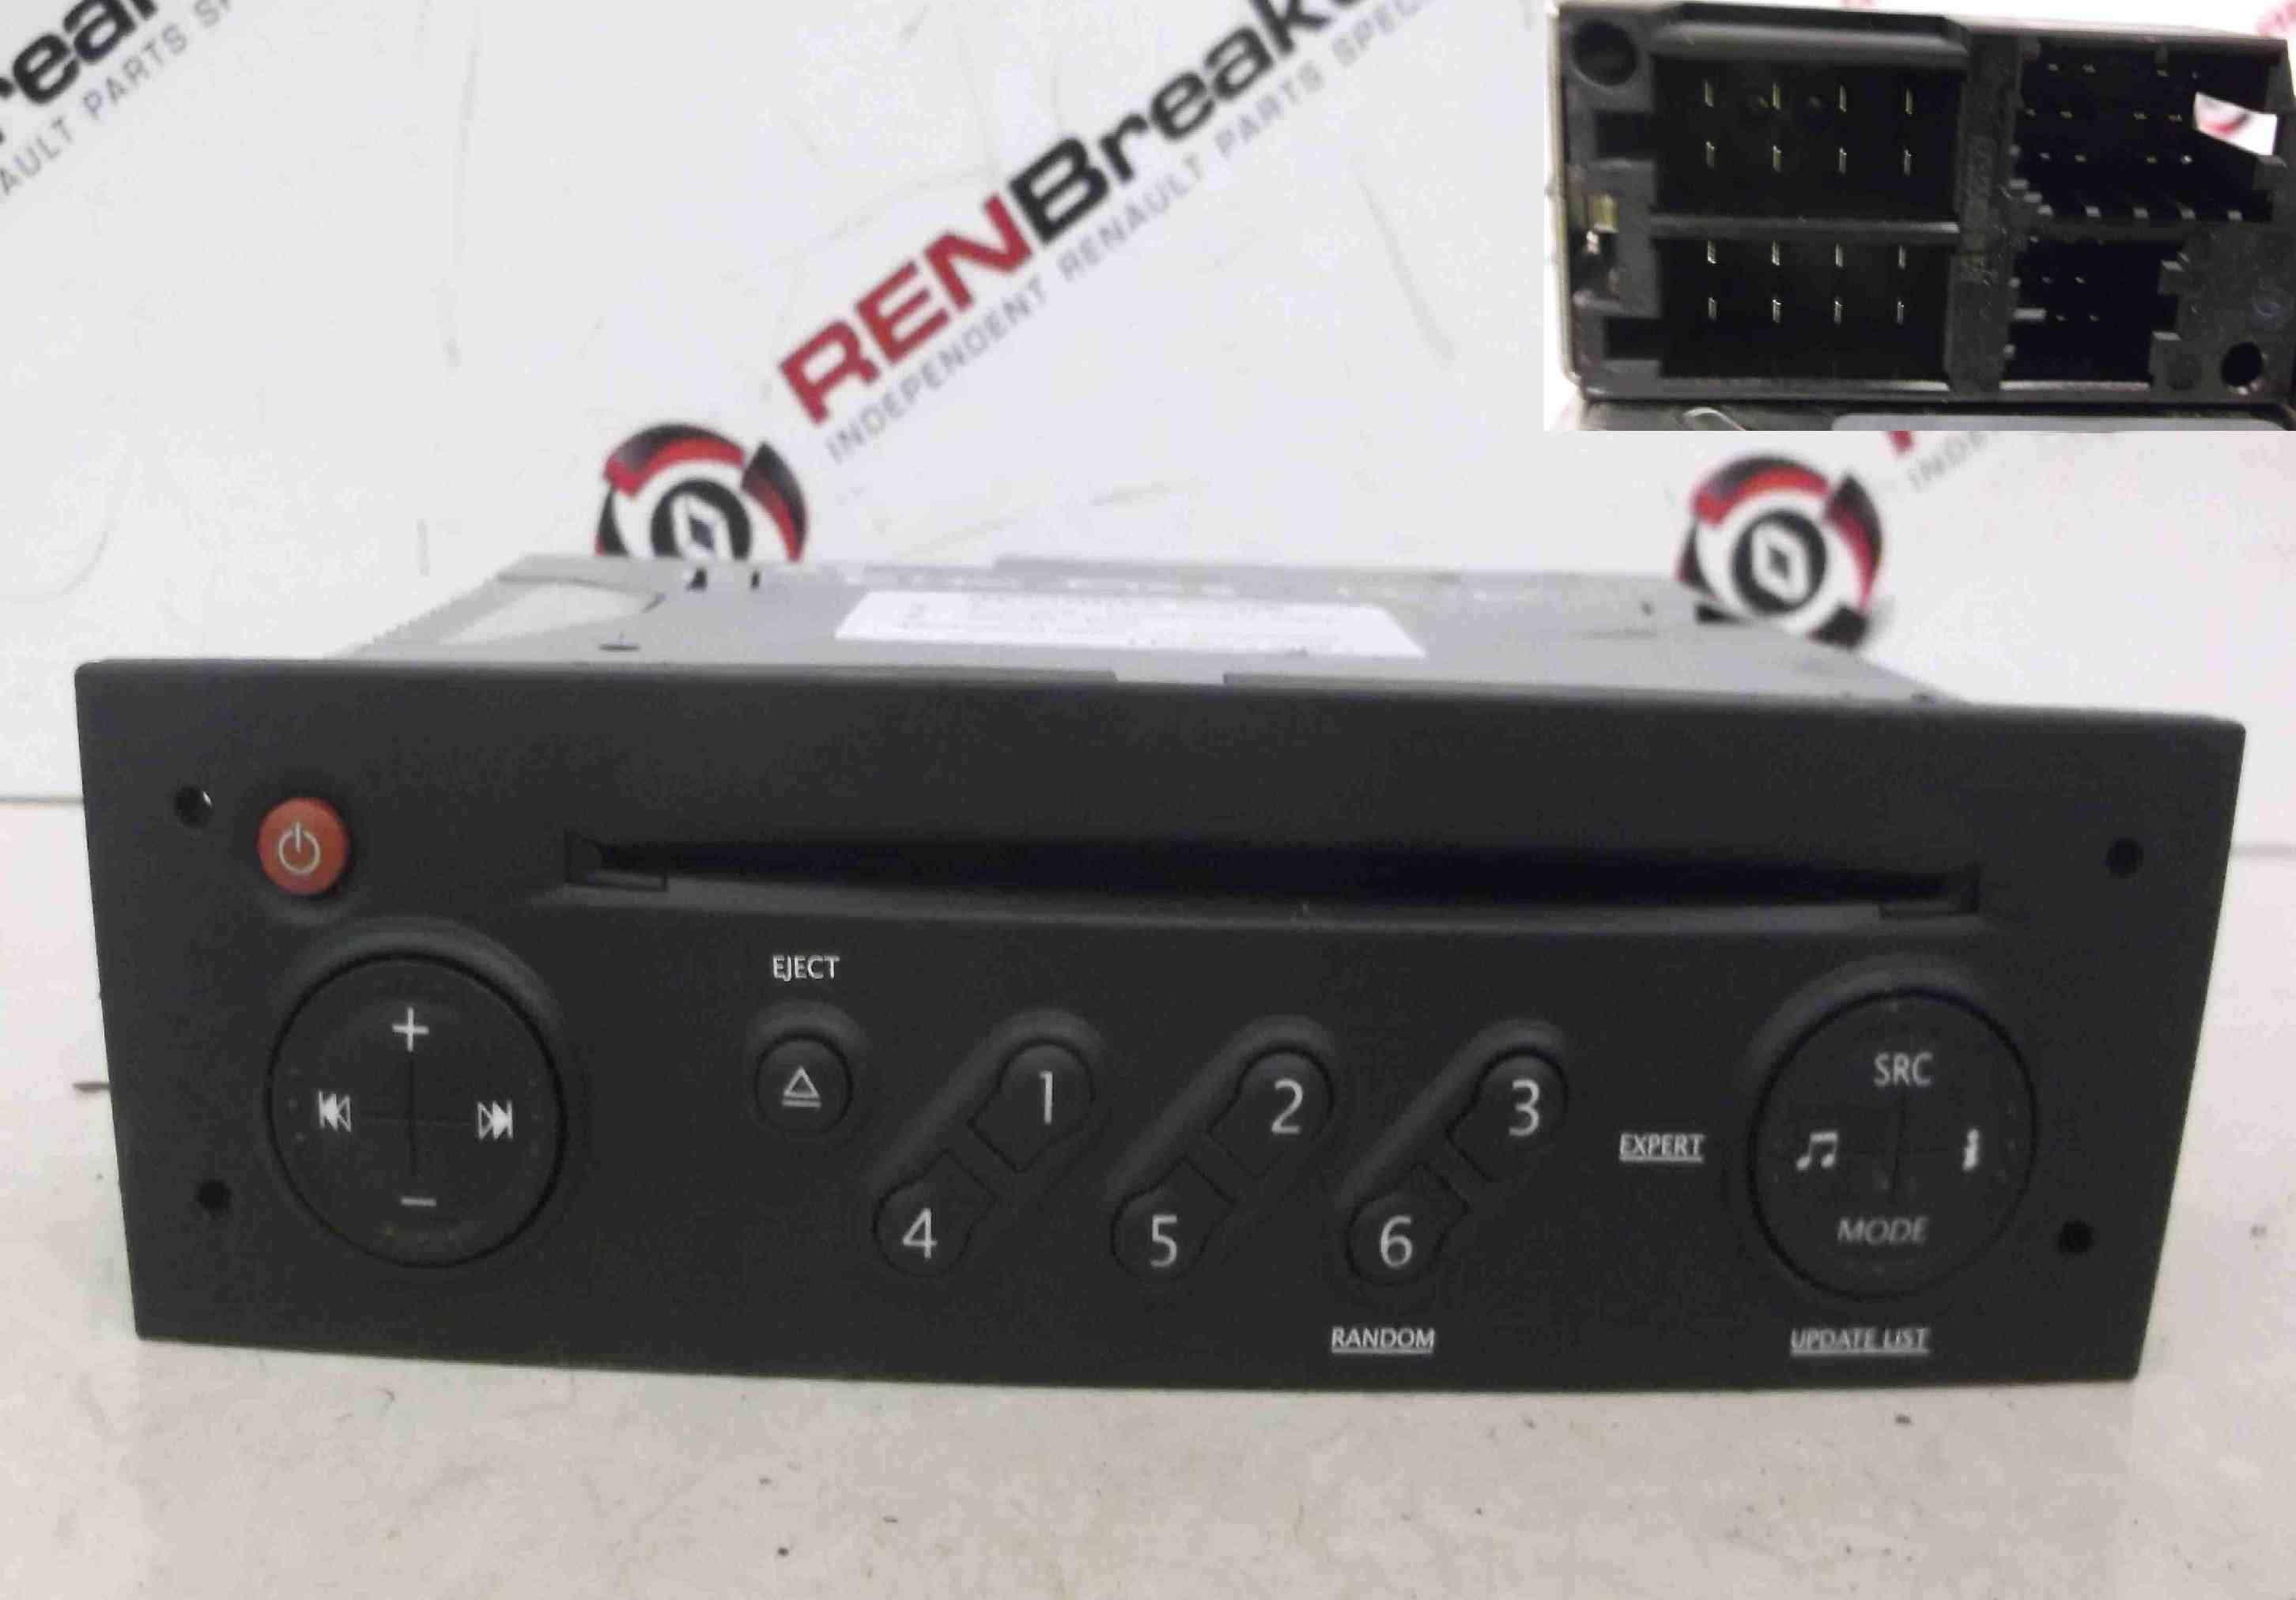 Renault Clio MK3 2005-2009 Cd Player Radio Update List + Code 8200607915